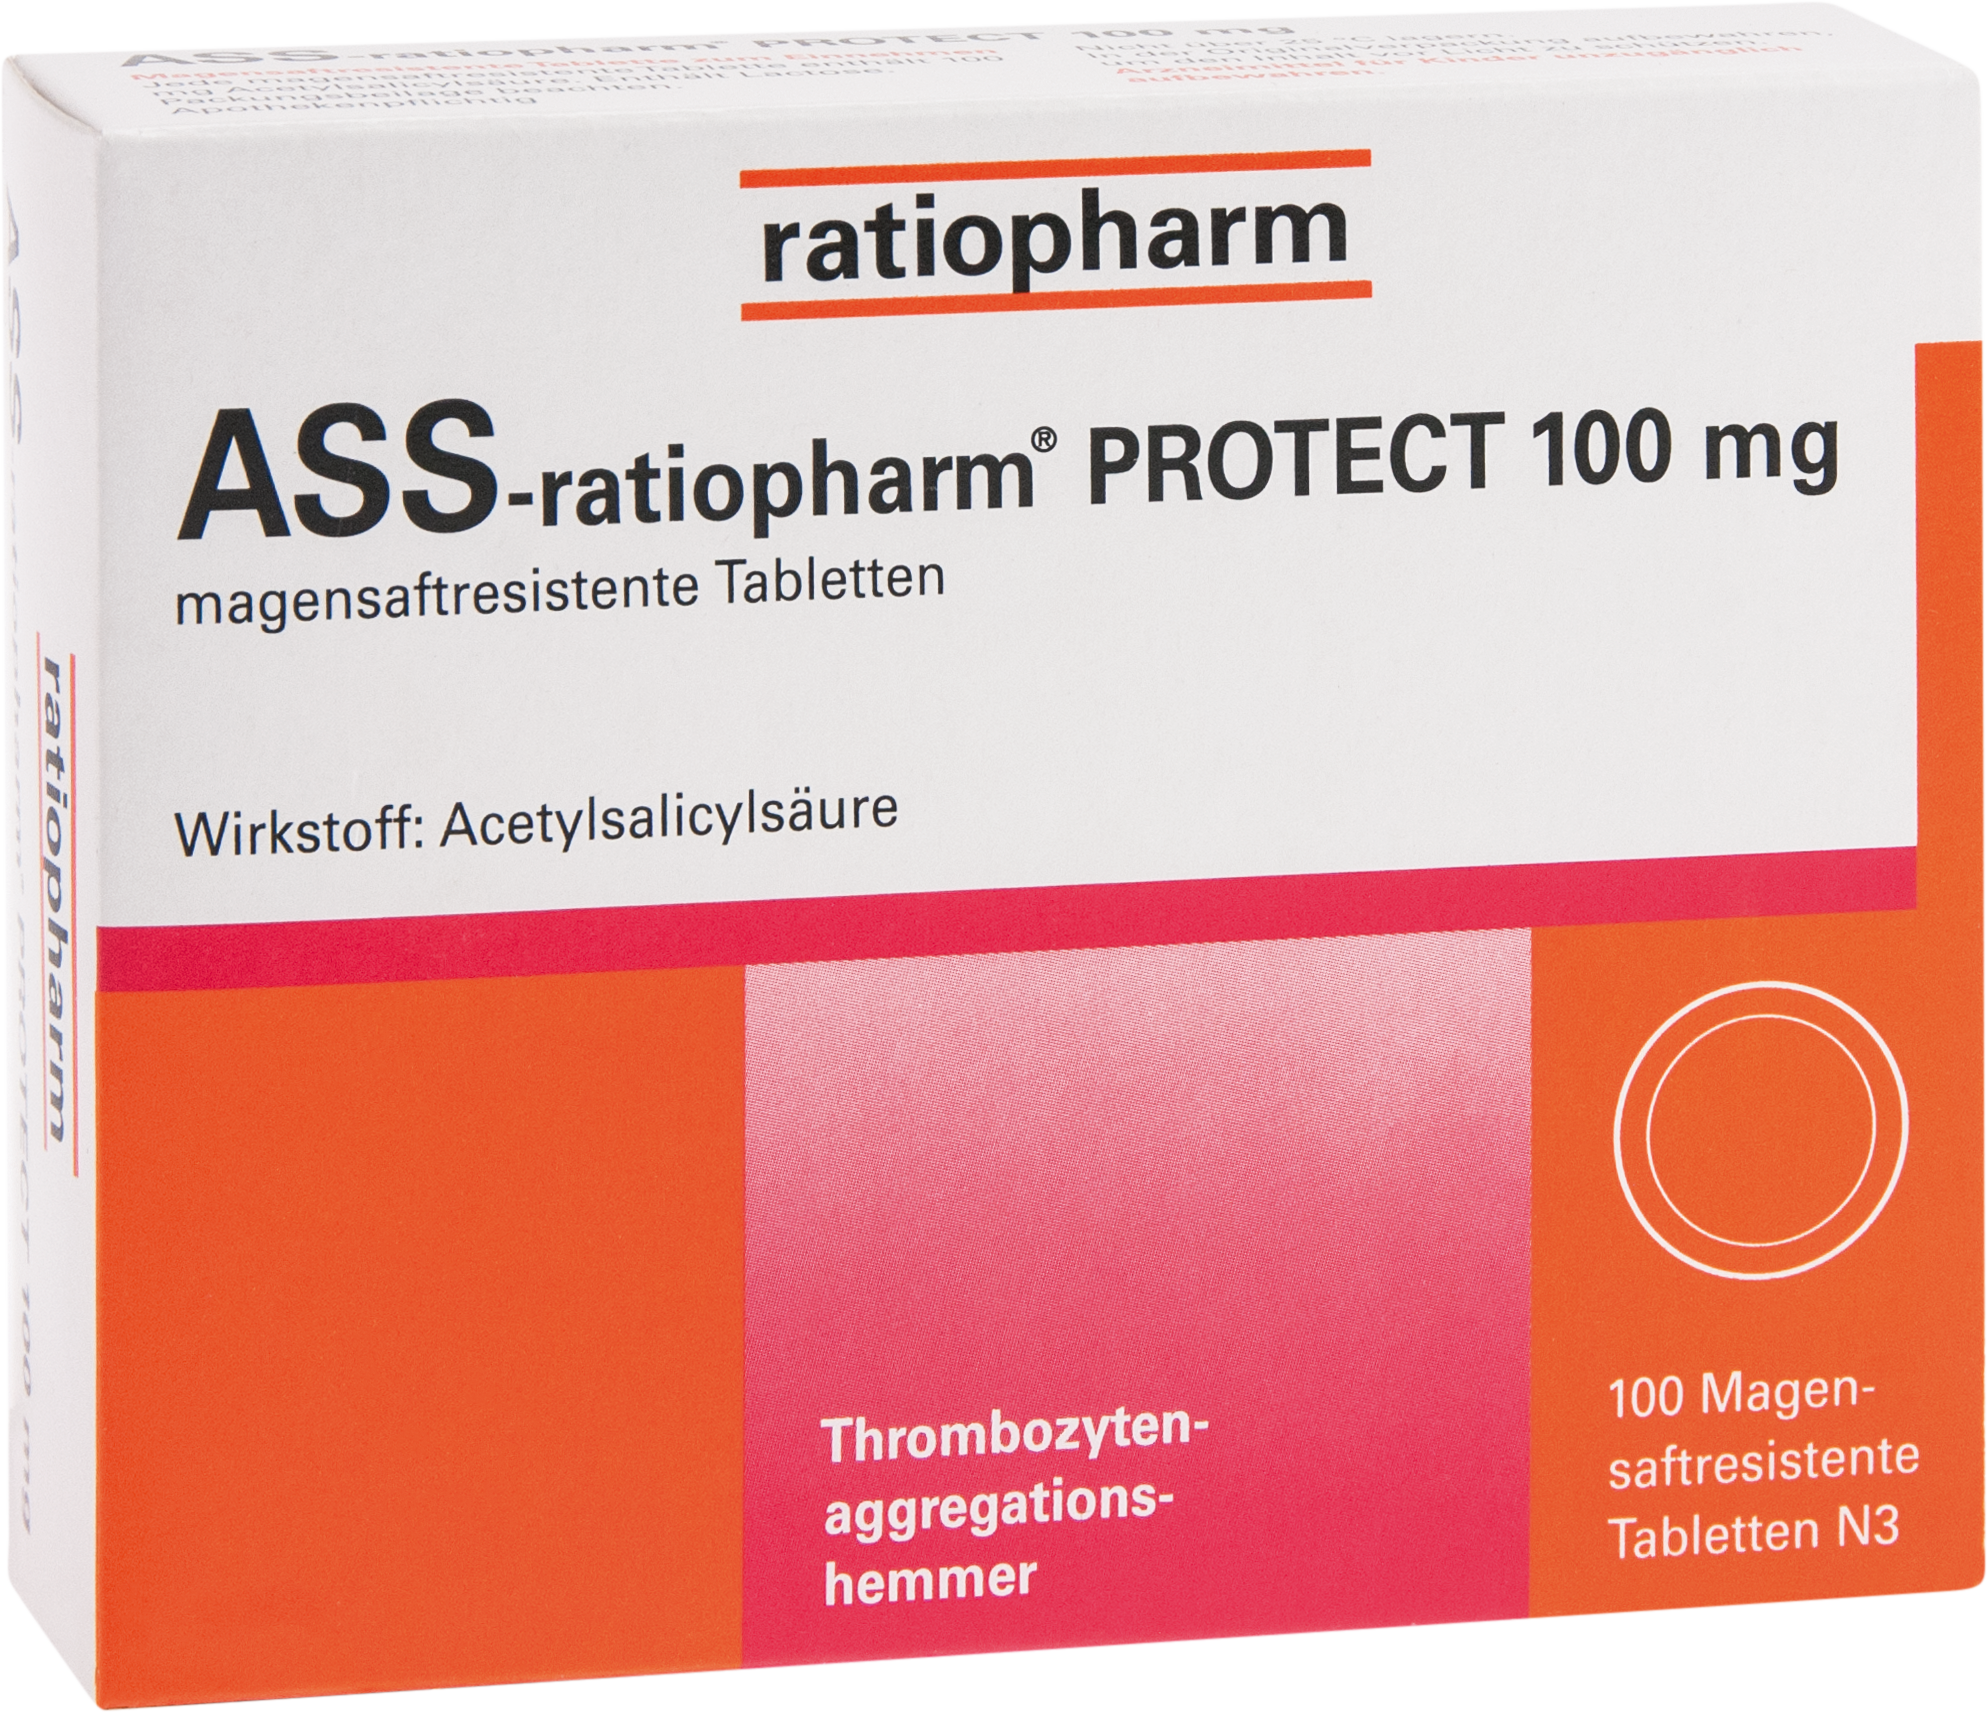 ASS-ratiopharm PROTECT 100mg